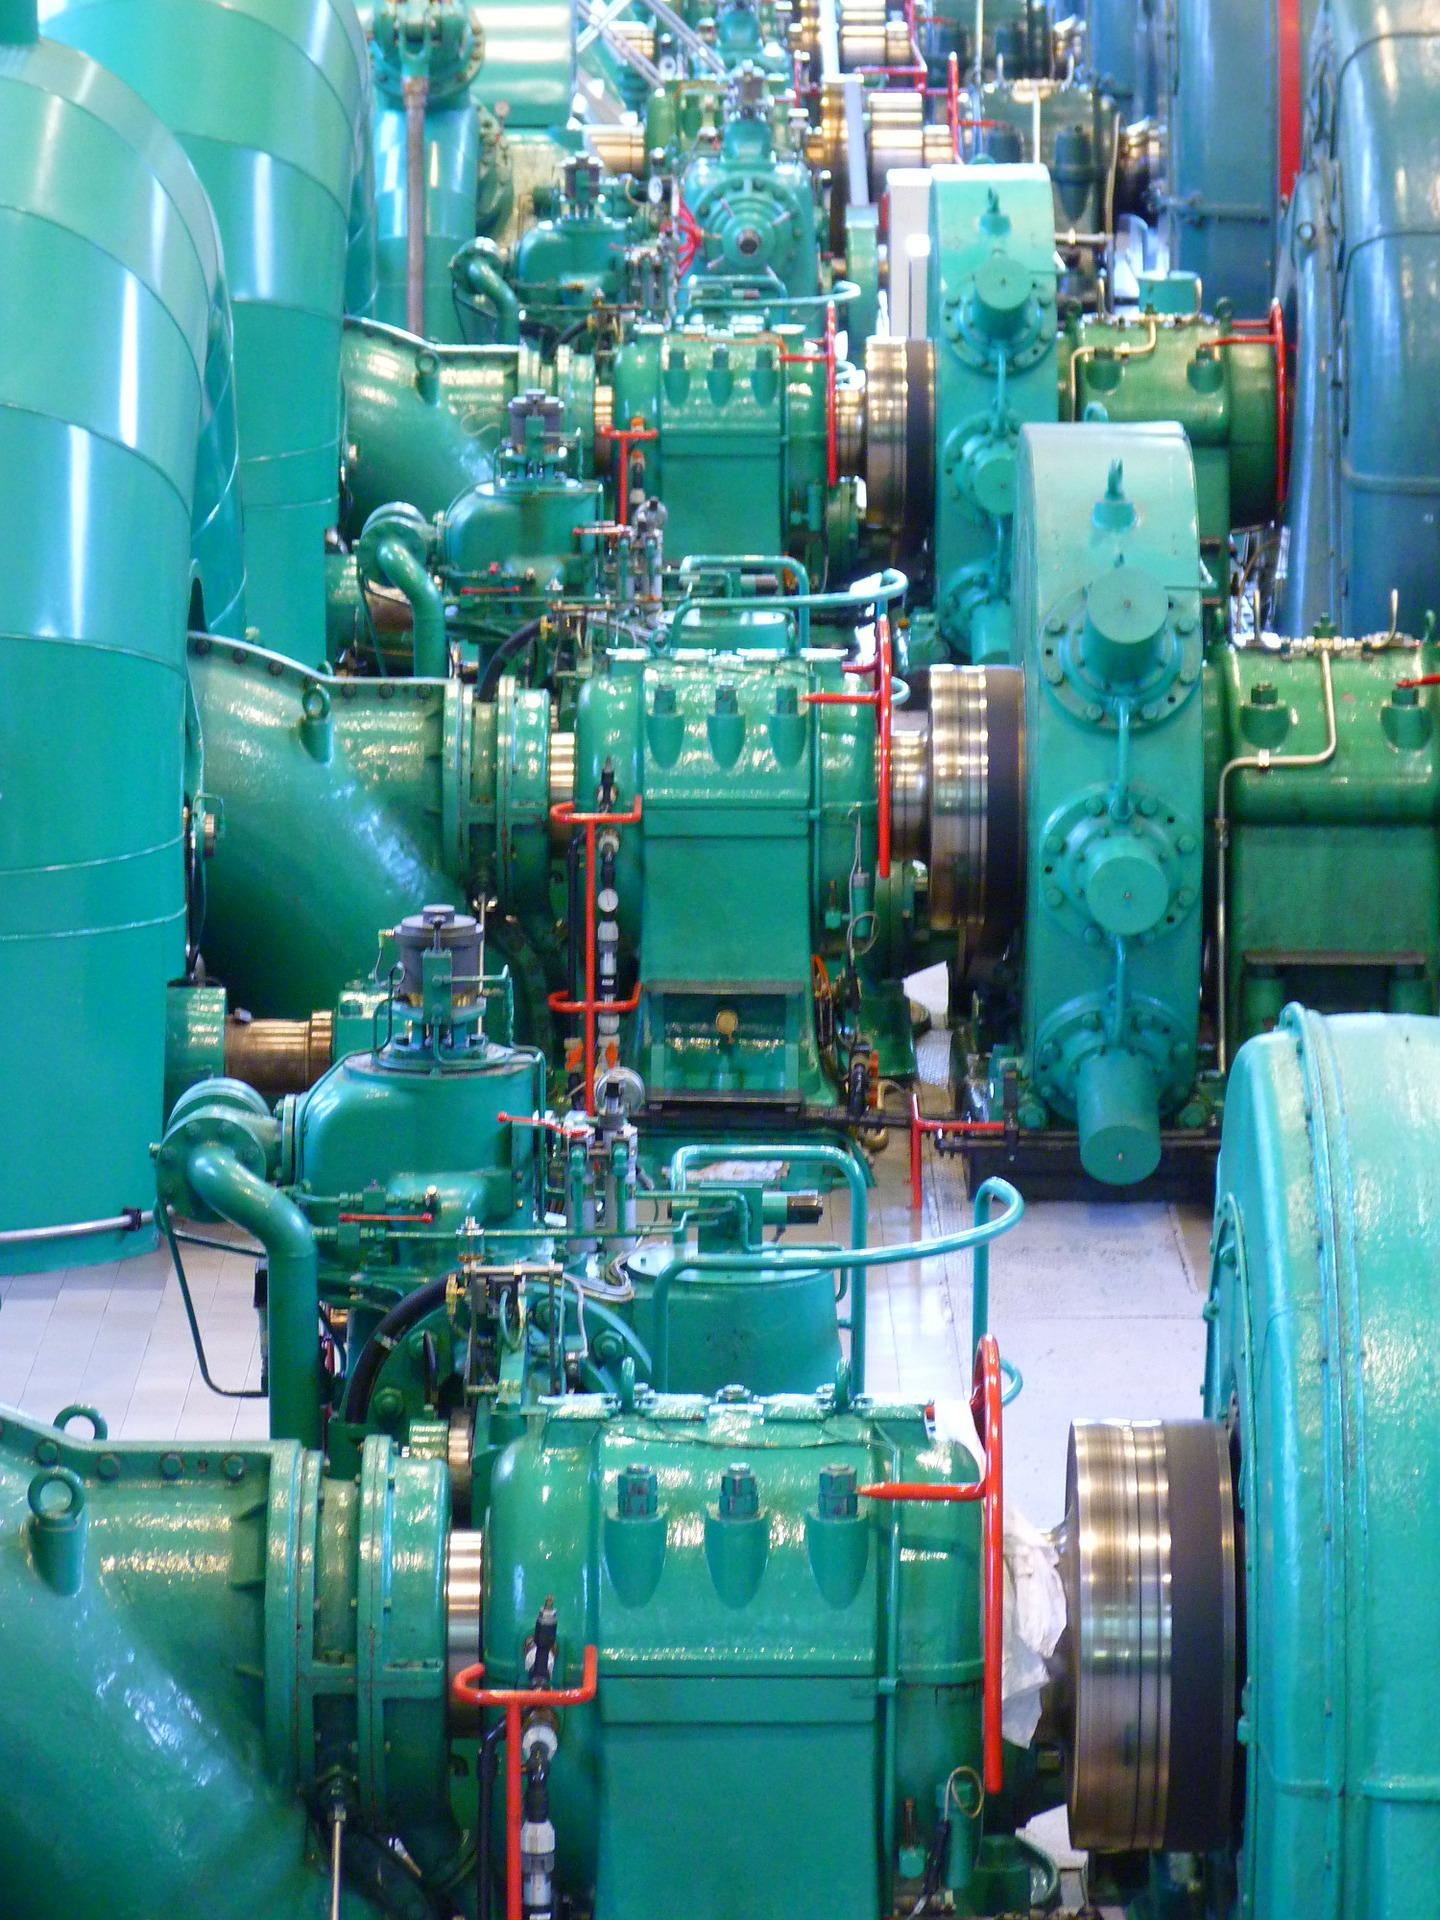 turbine-51755_1920